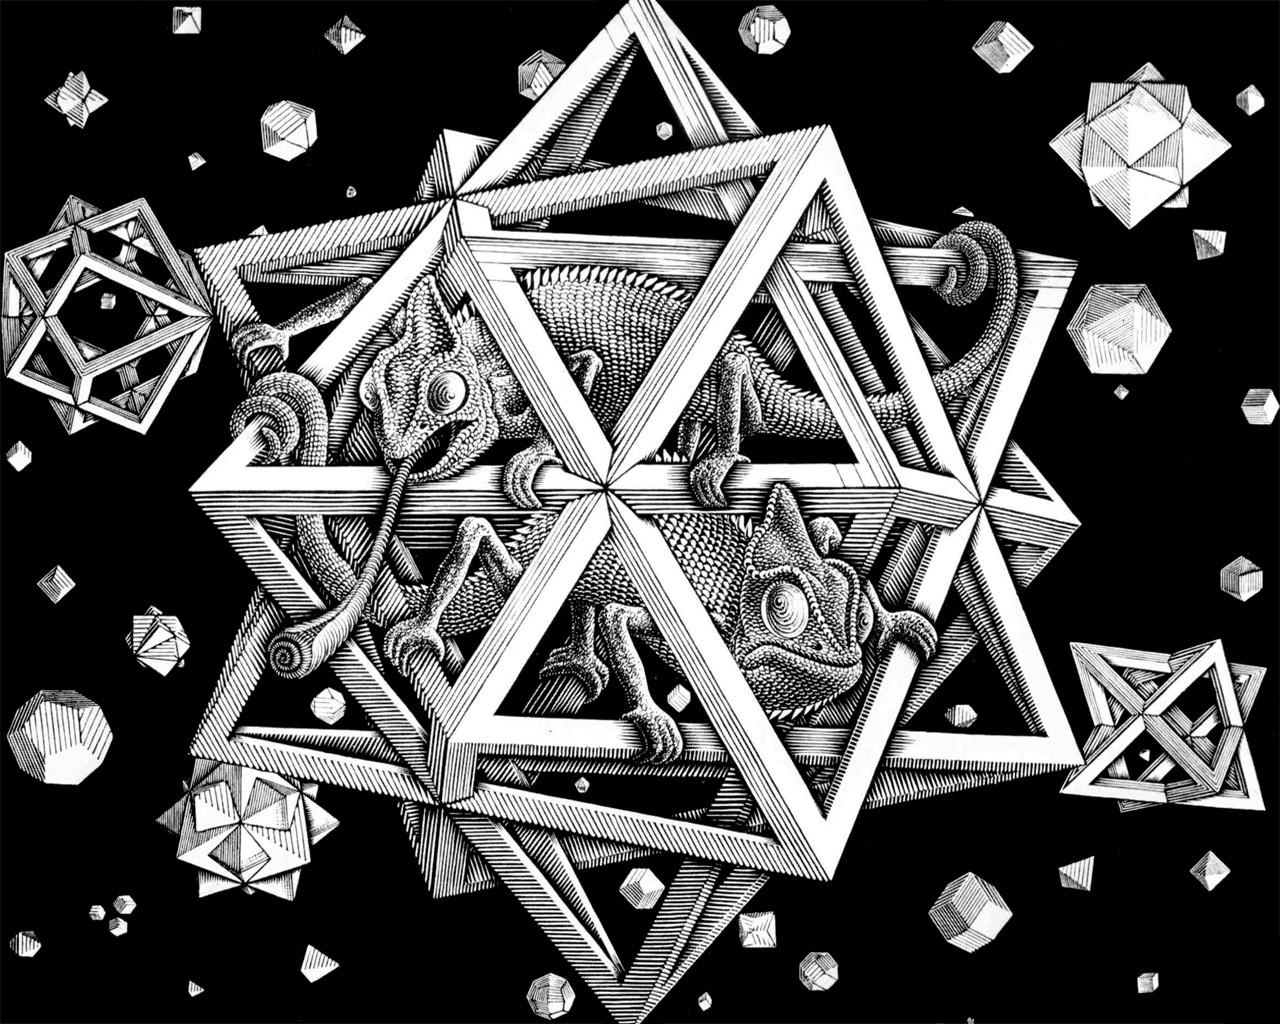 digital art simple background M C Escher optical illusion artwork drawing geometry 3D 93295